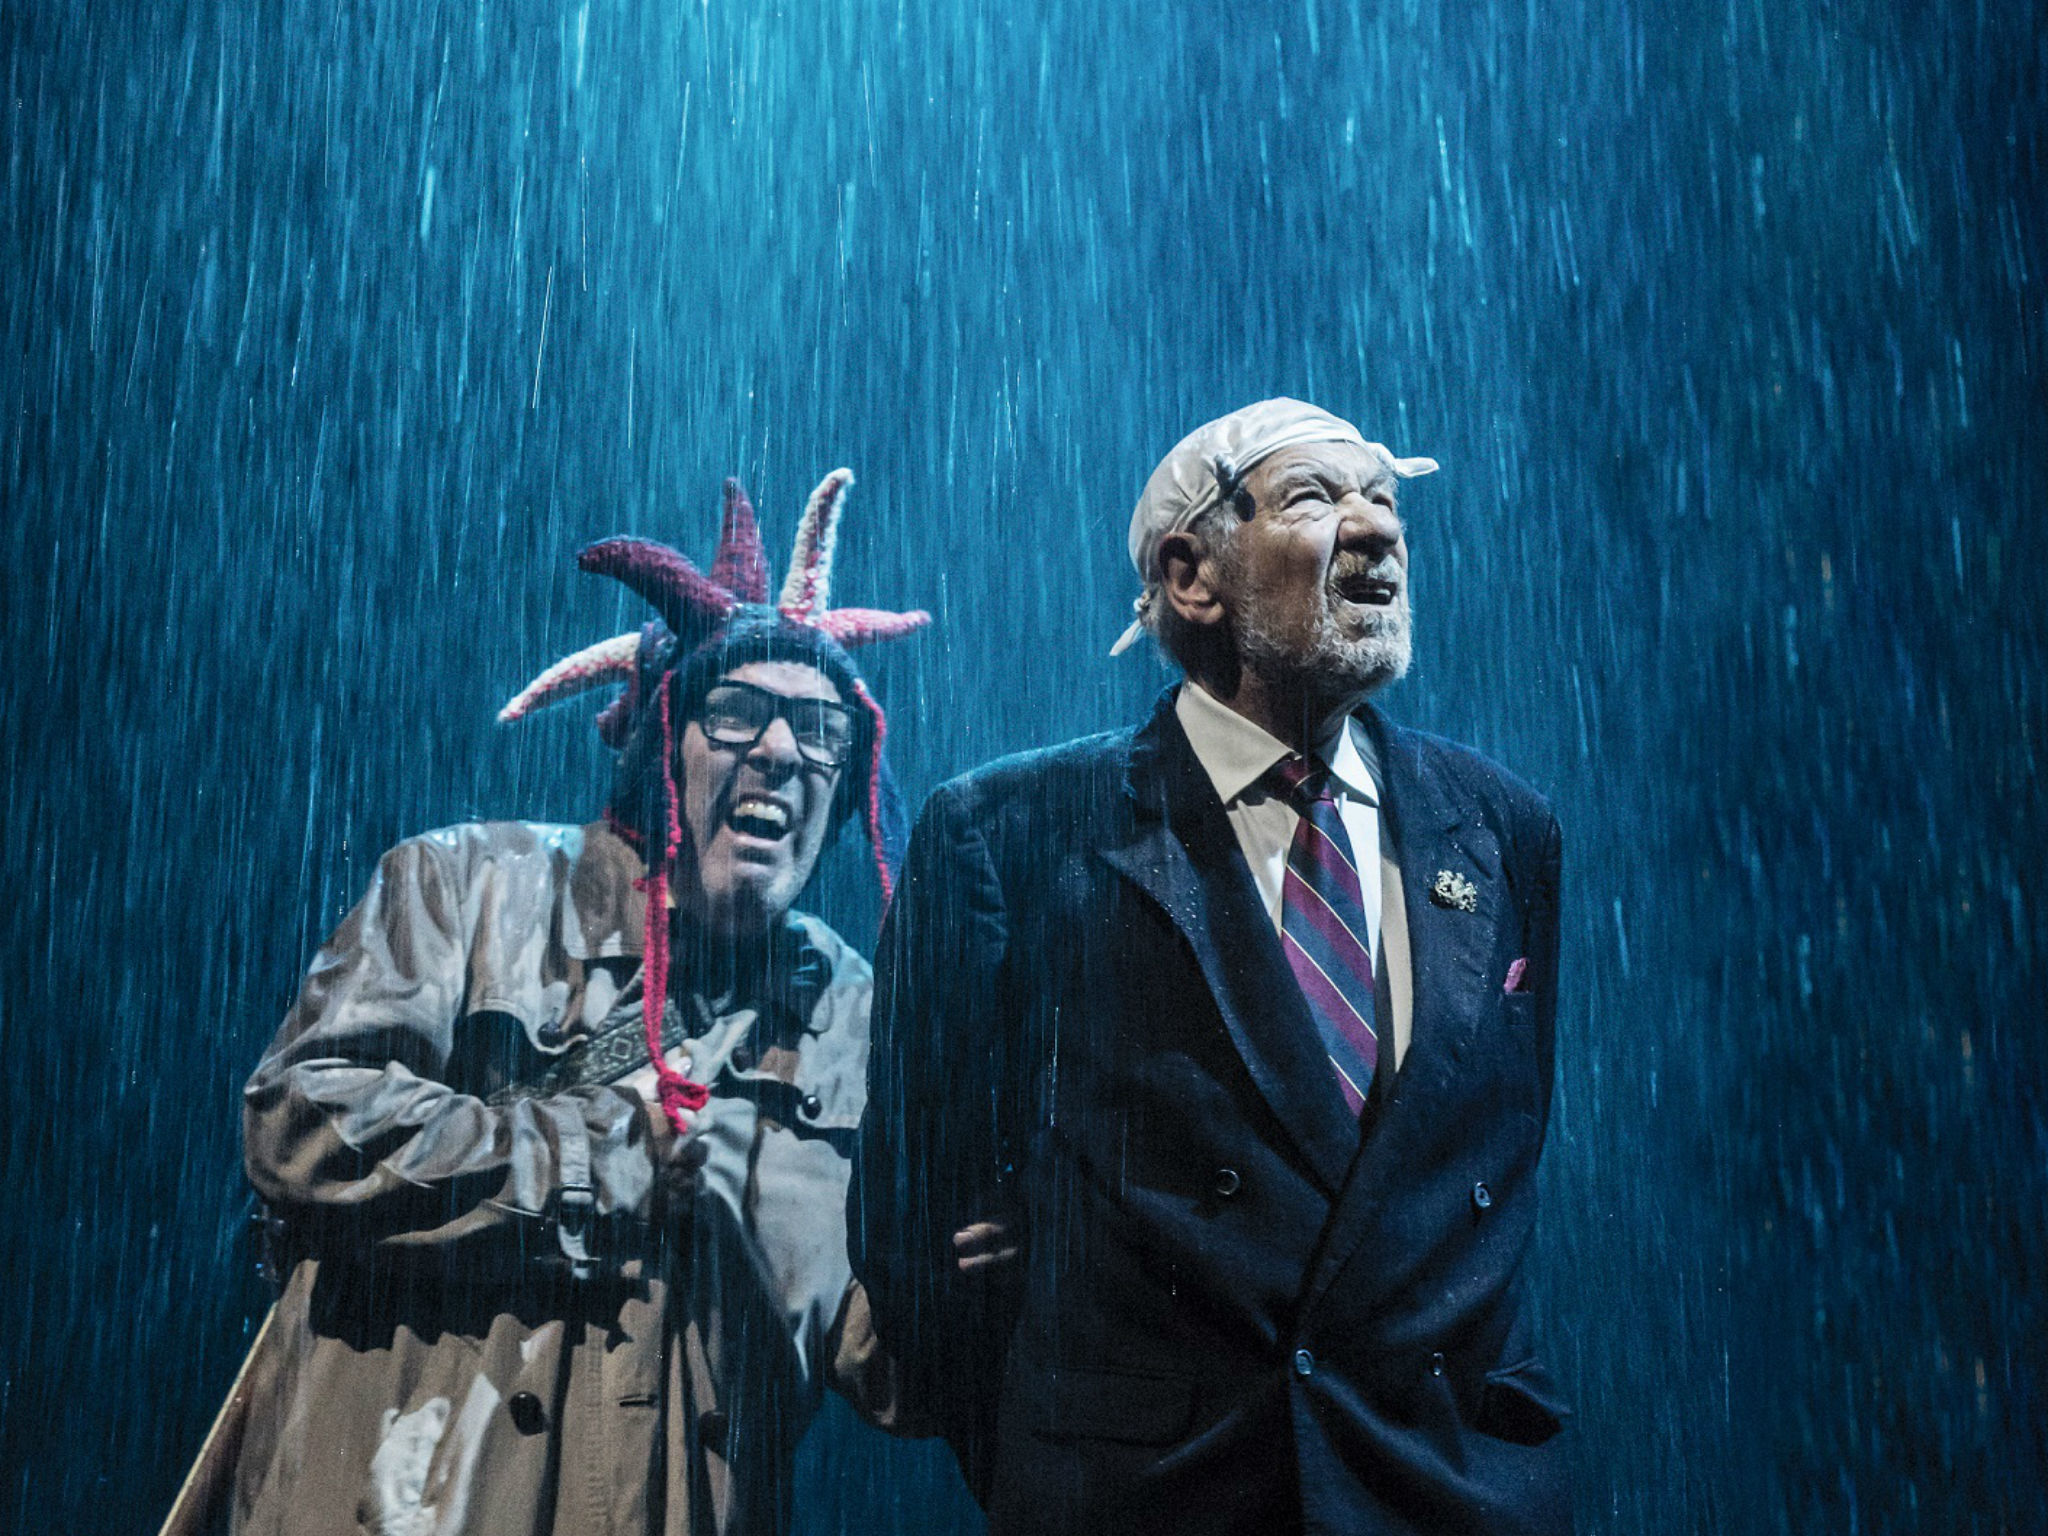 "<meta charset=""utf-8"" /><p><span>Lloyd Hutchinson as Fool and Ian McKellen as King Lear</span></p>"